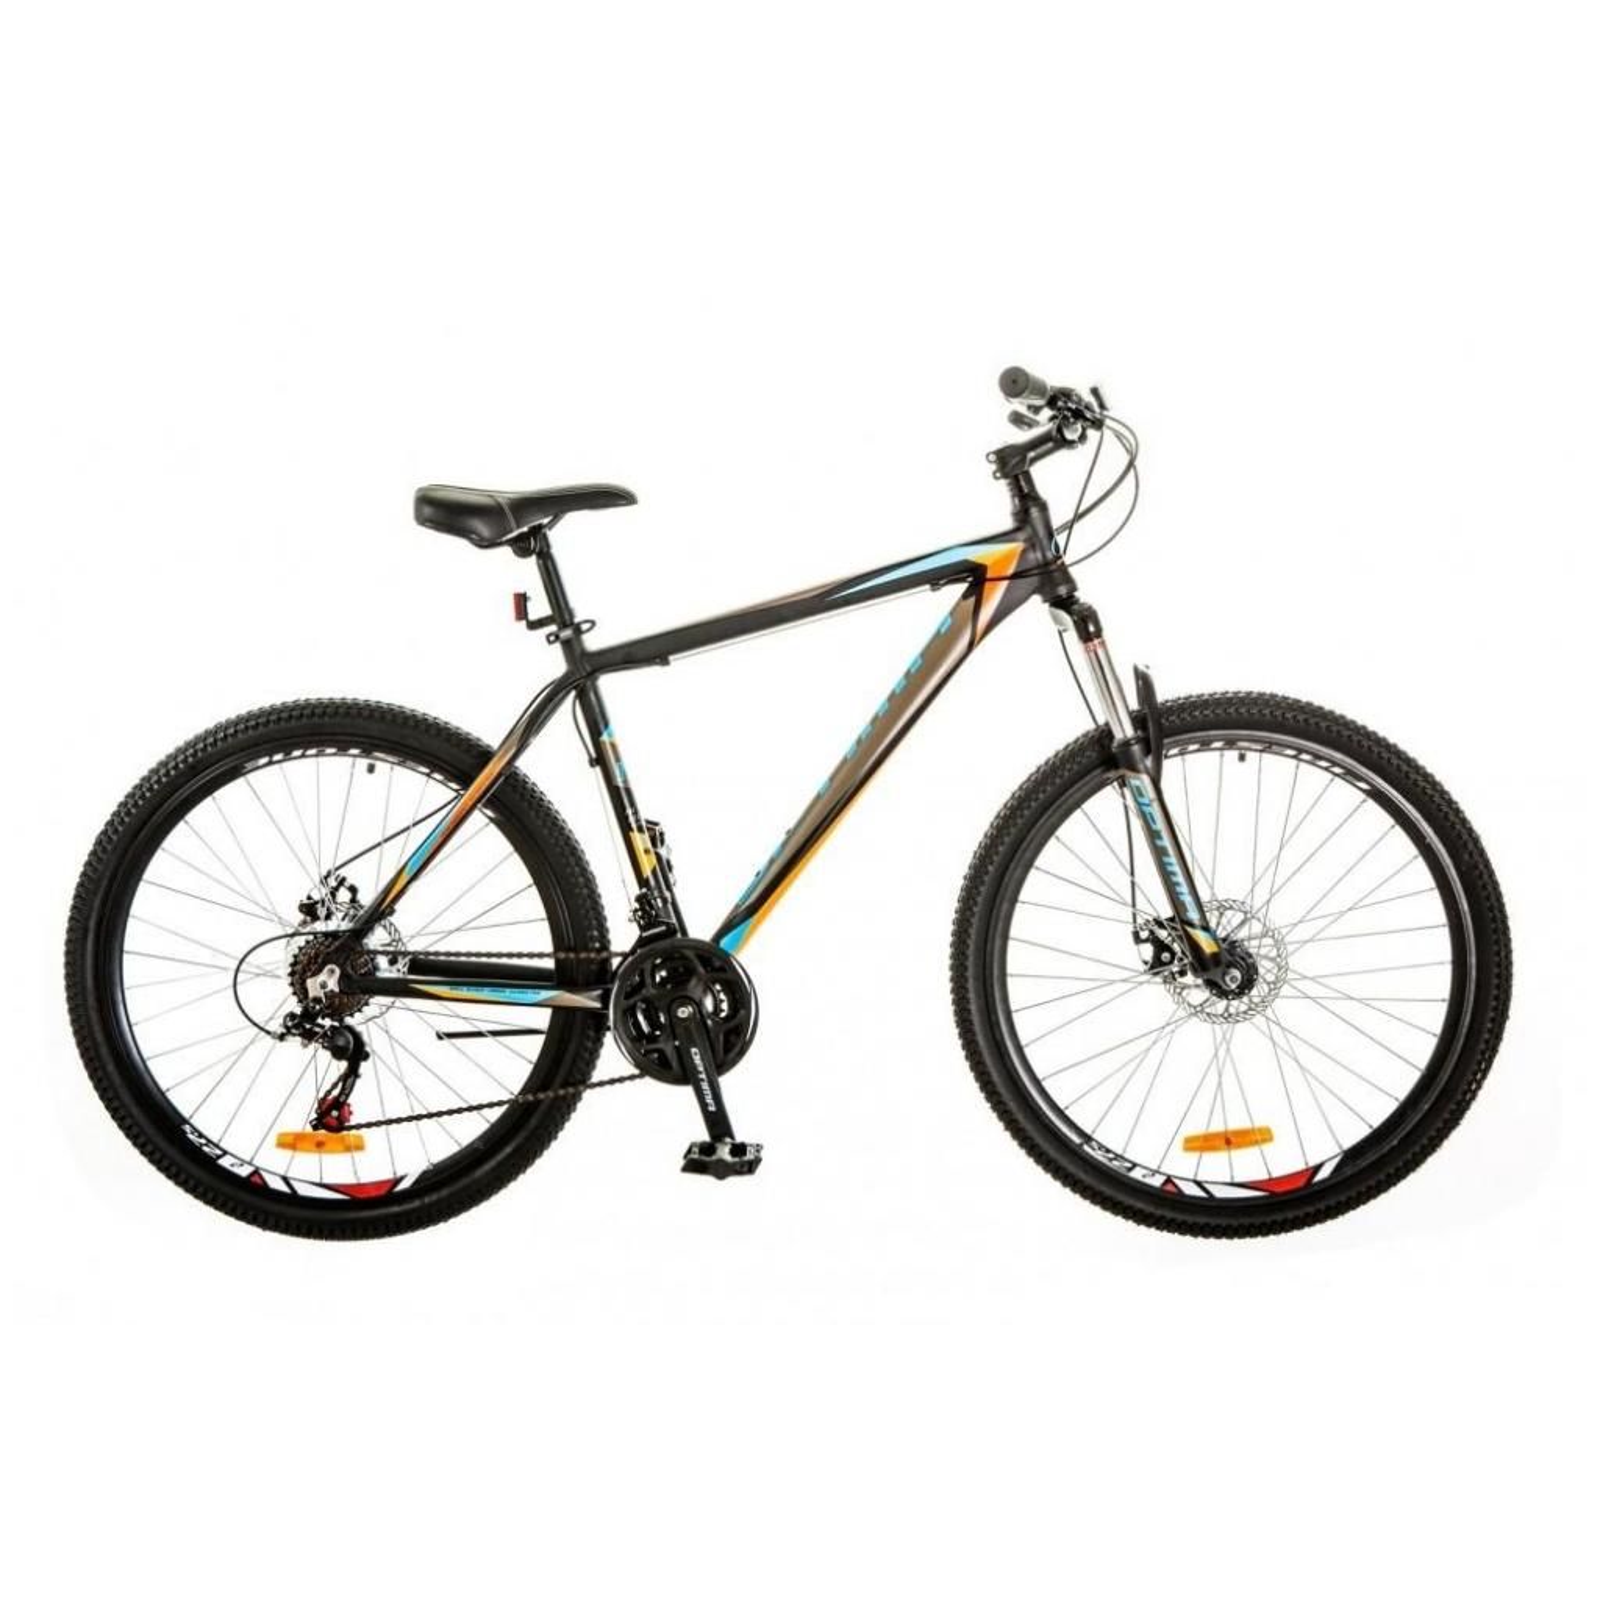 "Велосипед Optimabikes 27.5"" GRAVITY 2018 AM 14G DD рама-19"" Al серый с оранжевым (OPS-OP-27.5-023)"